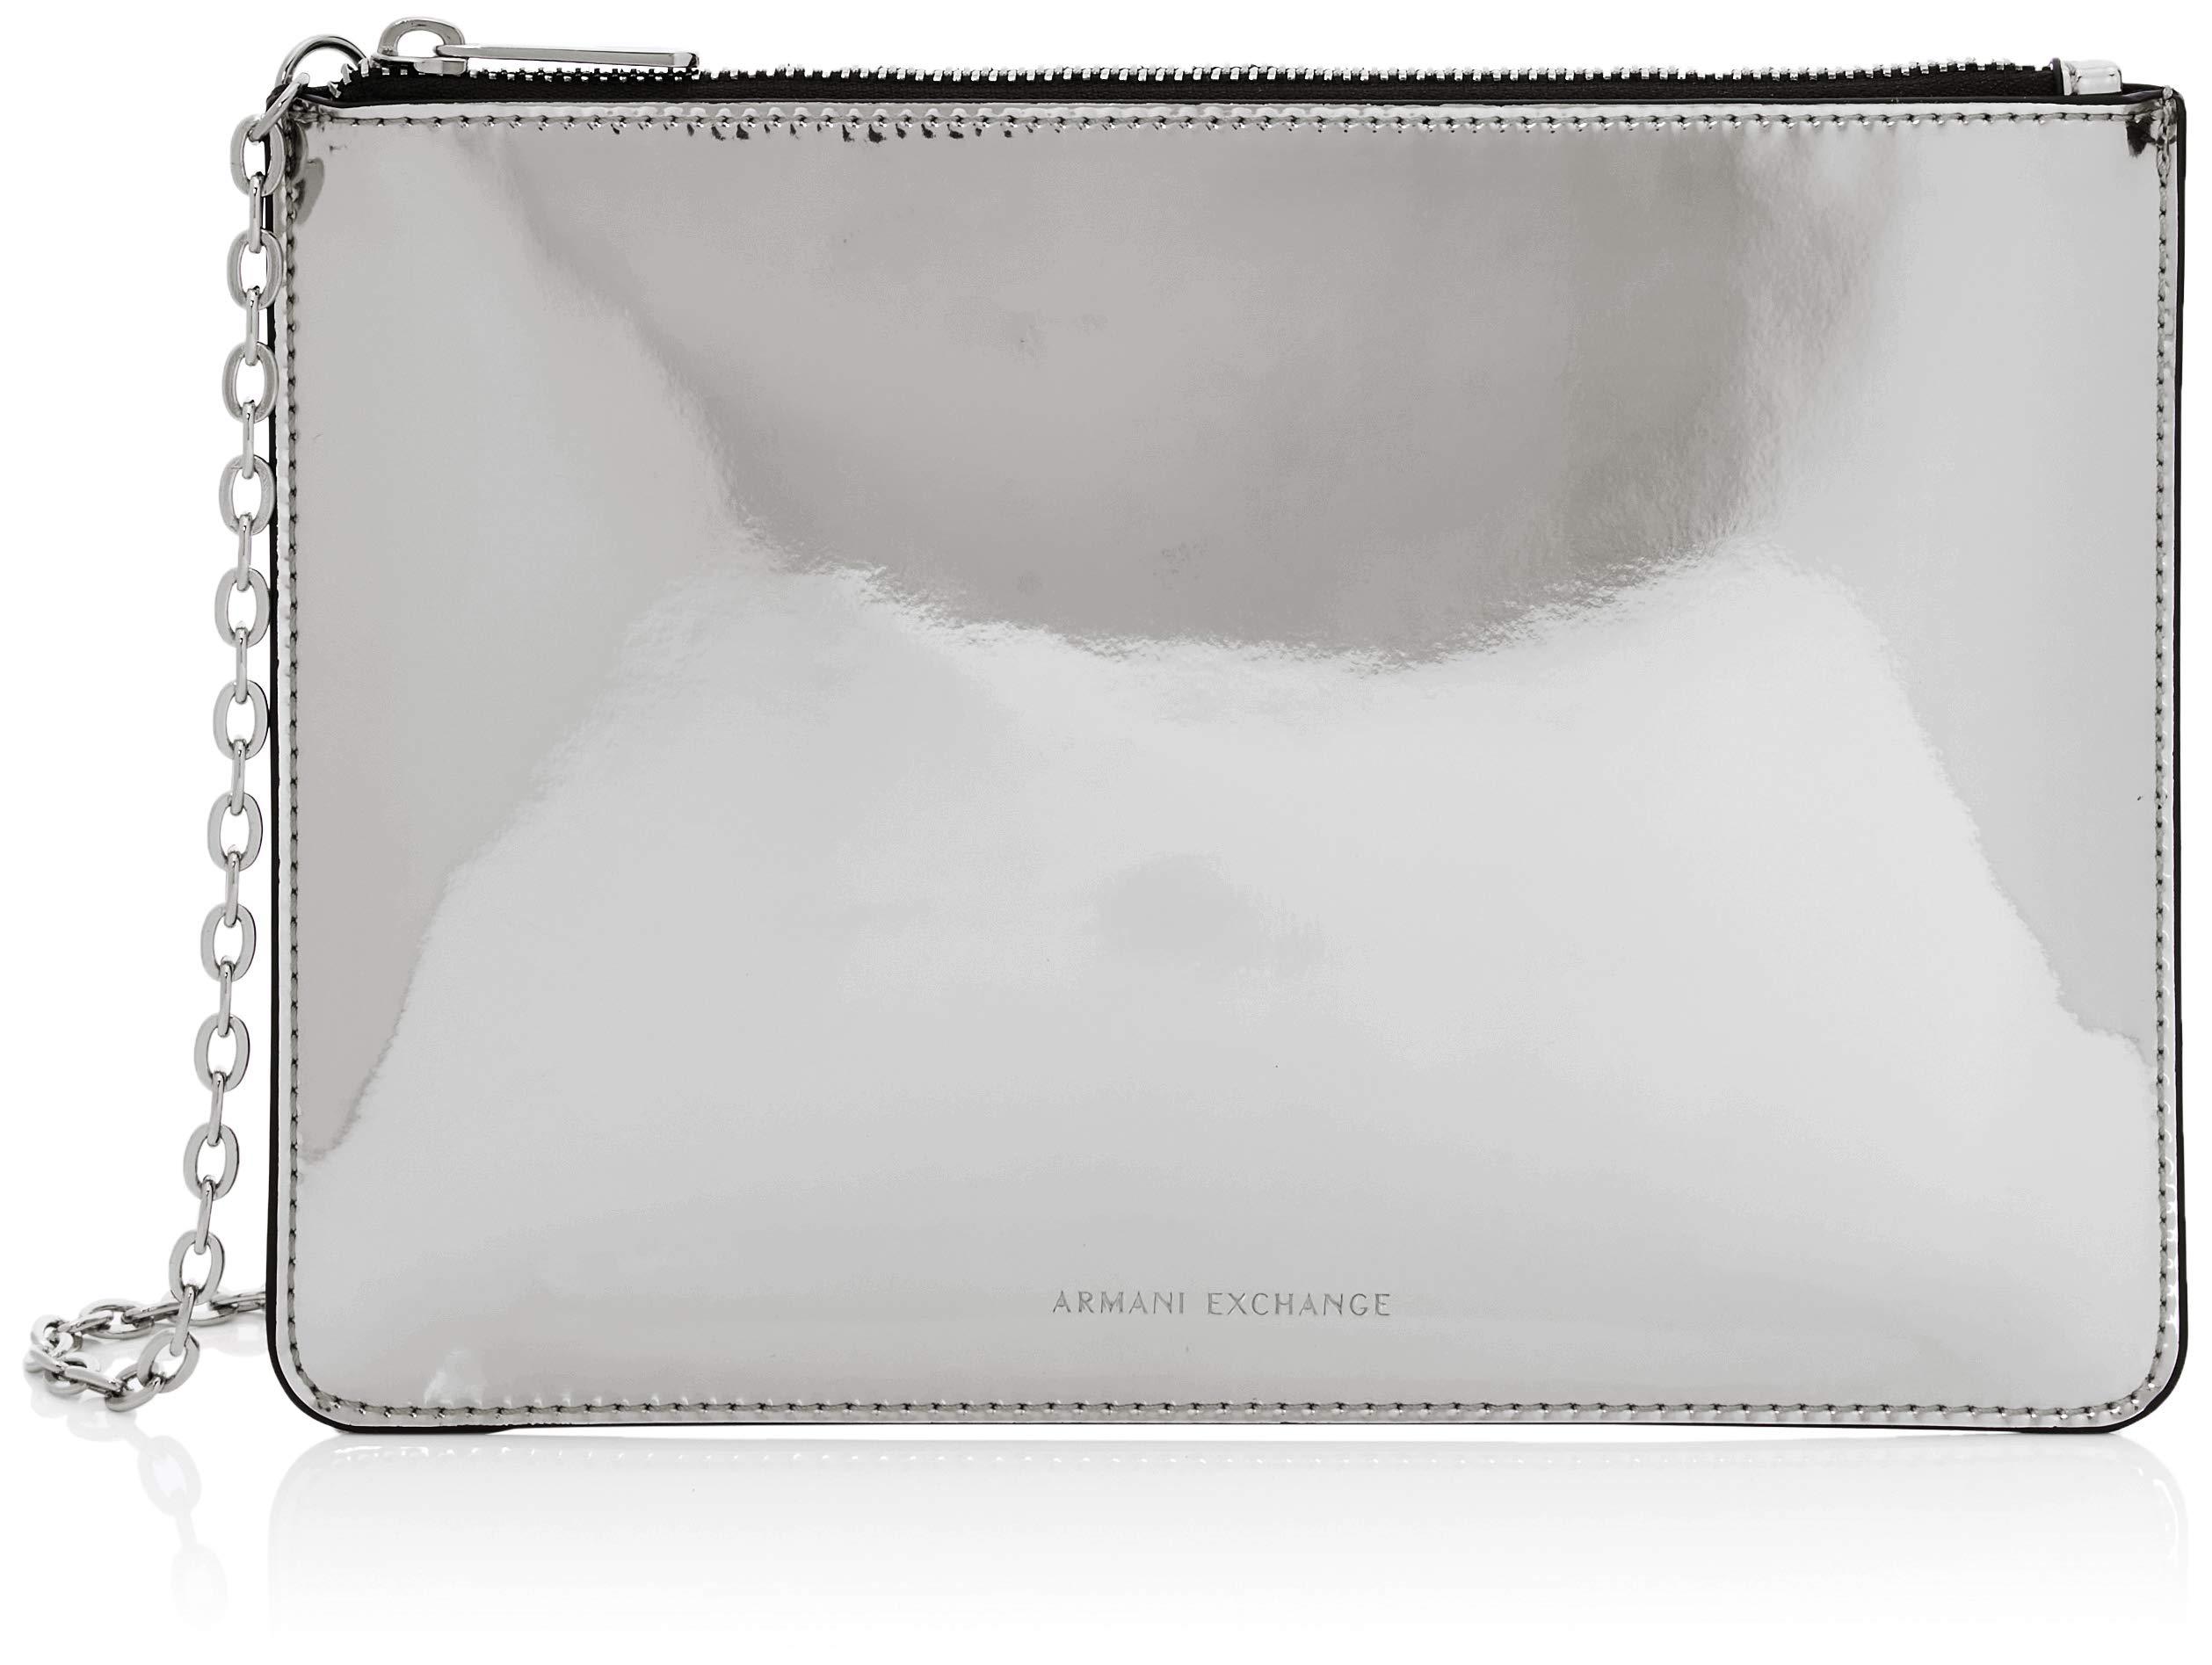 Armani Exchange – Flat Cross-body Bag, Bolsos bandolera Mujer, Plateado (Argento), 18.0×1.0x25.5 cm (B x H T)